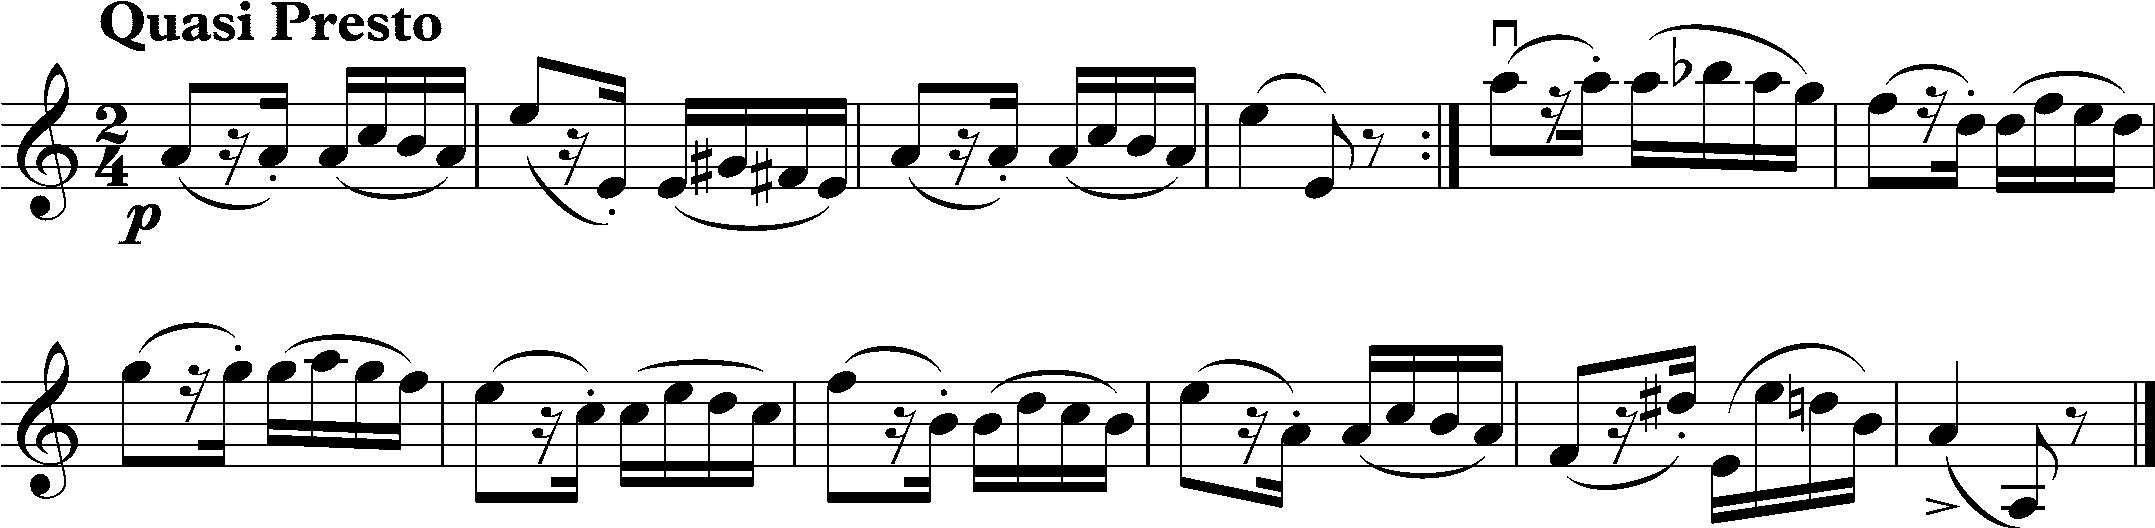 Paganini Caprice No. 24 Theme